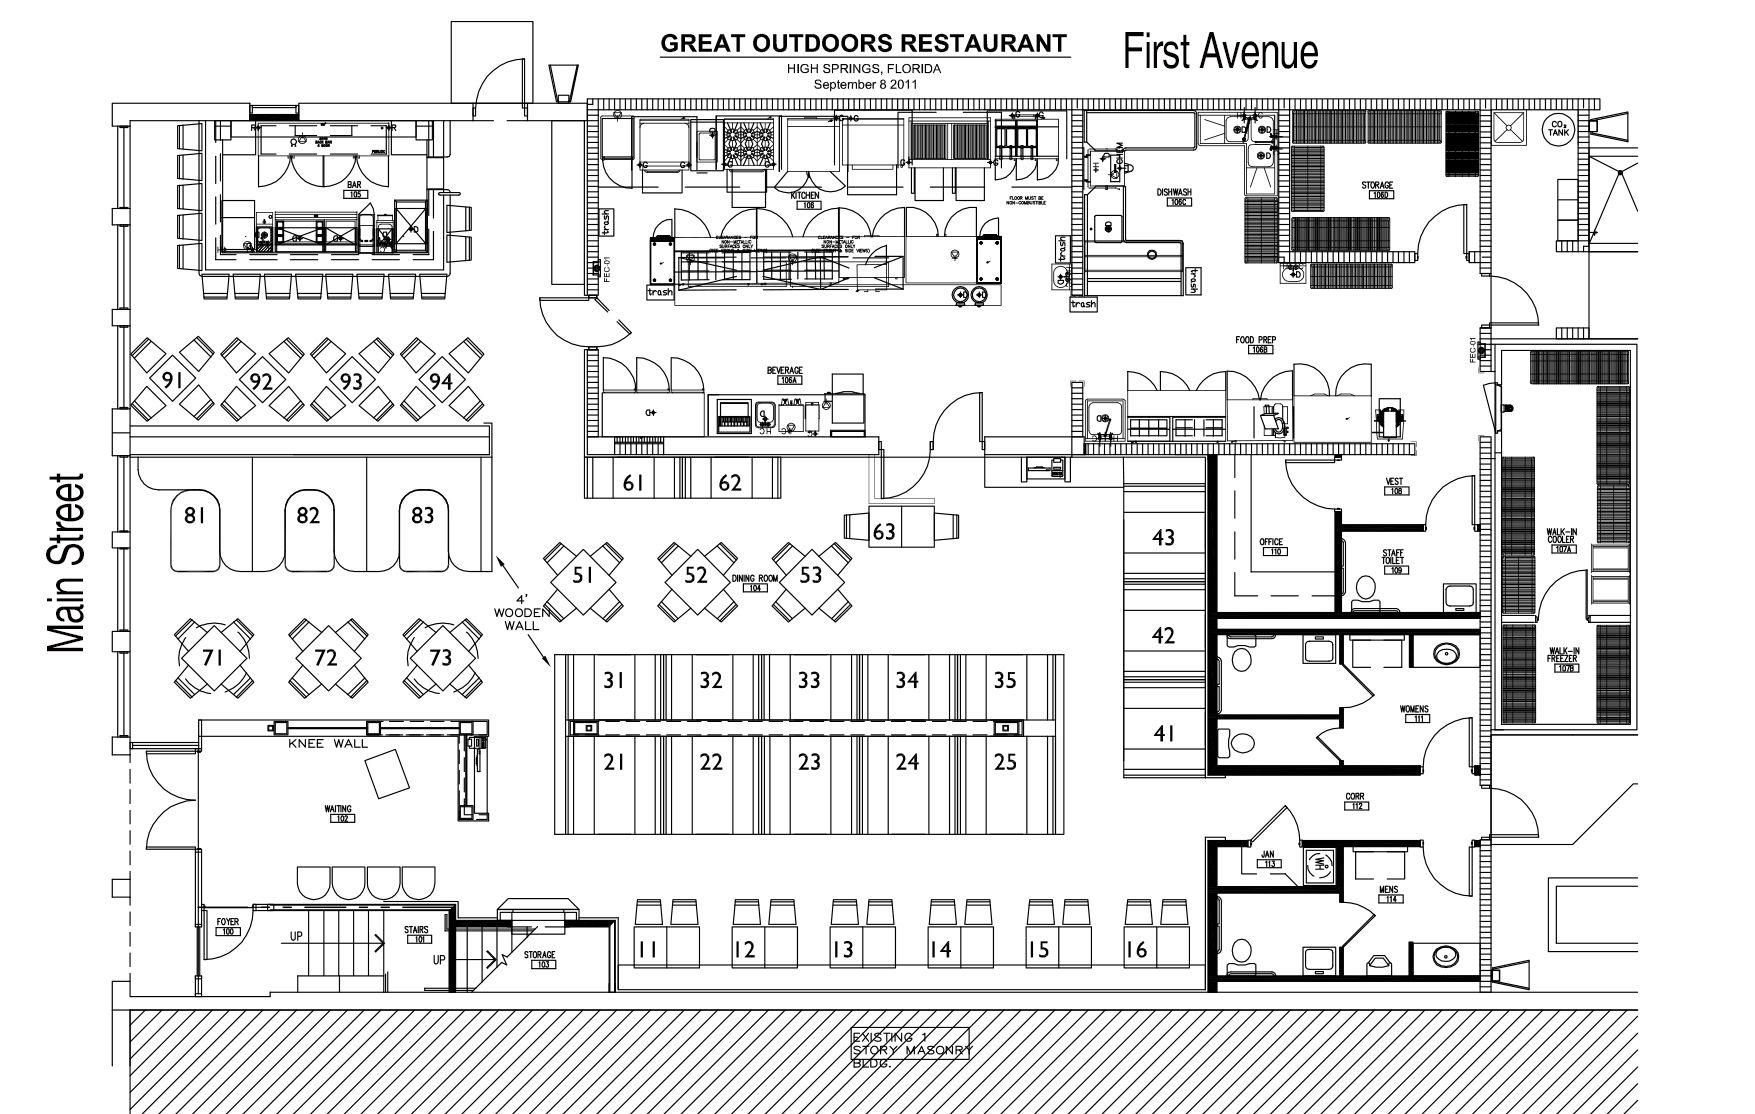 The Great Outdoors Restaurant Restaurant Floor Plan Restaurant